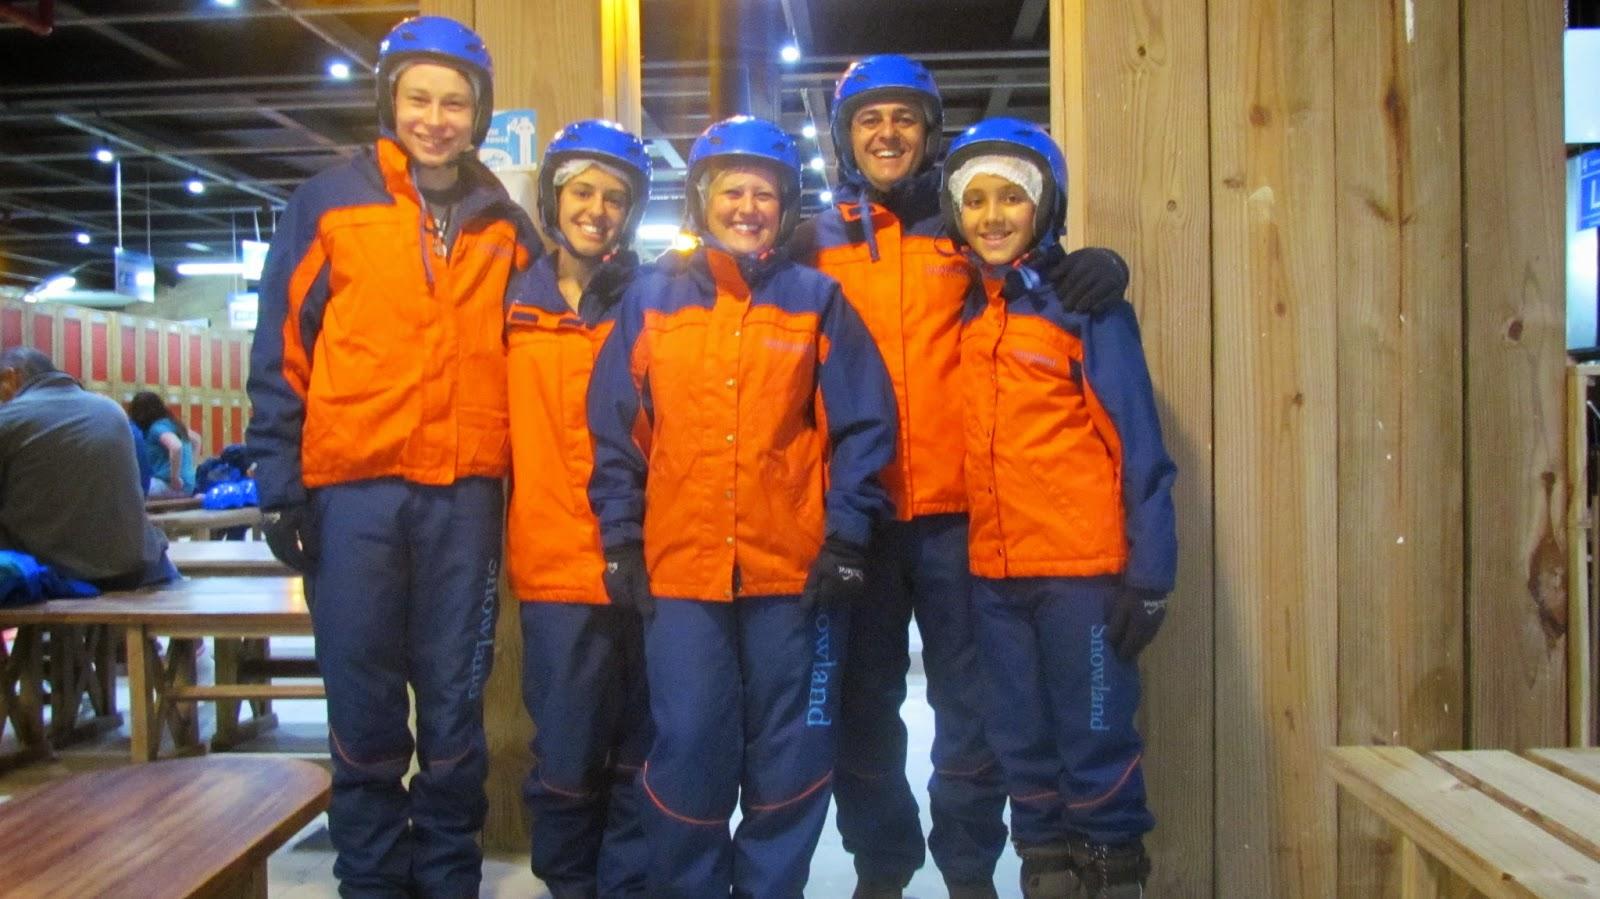 Snowland com teens